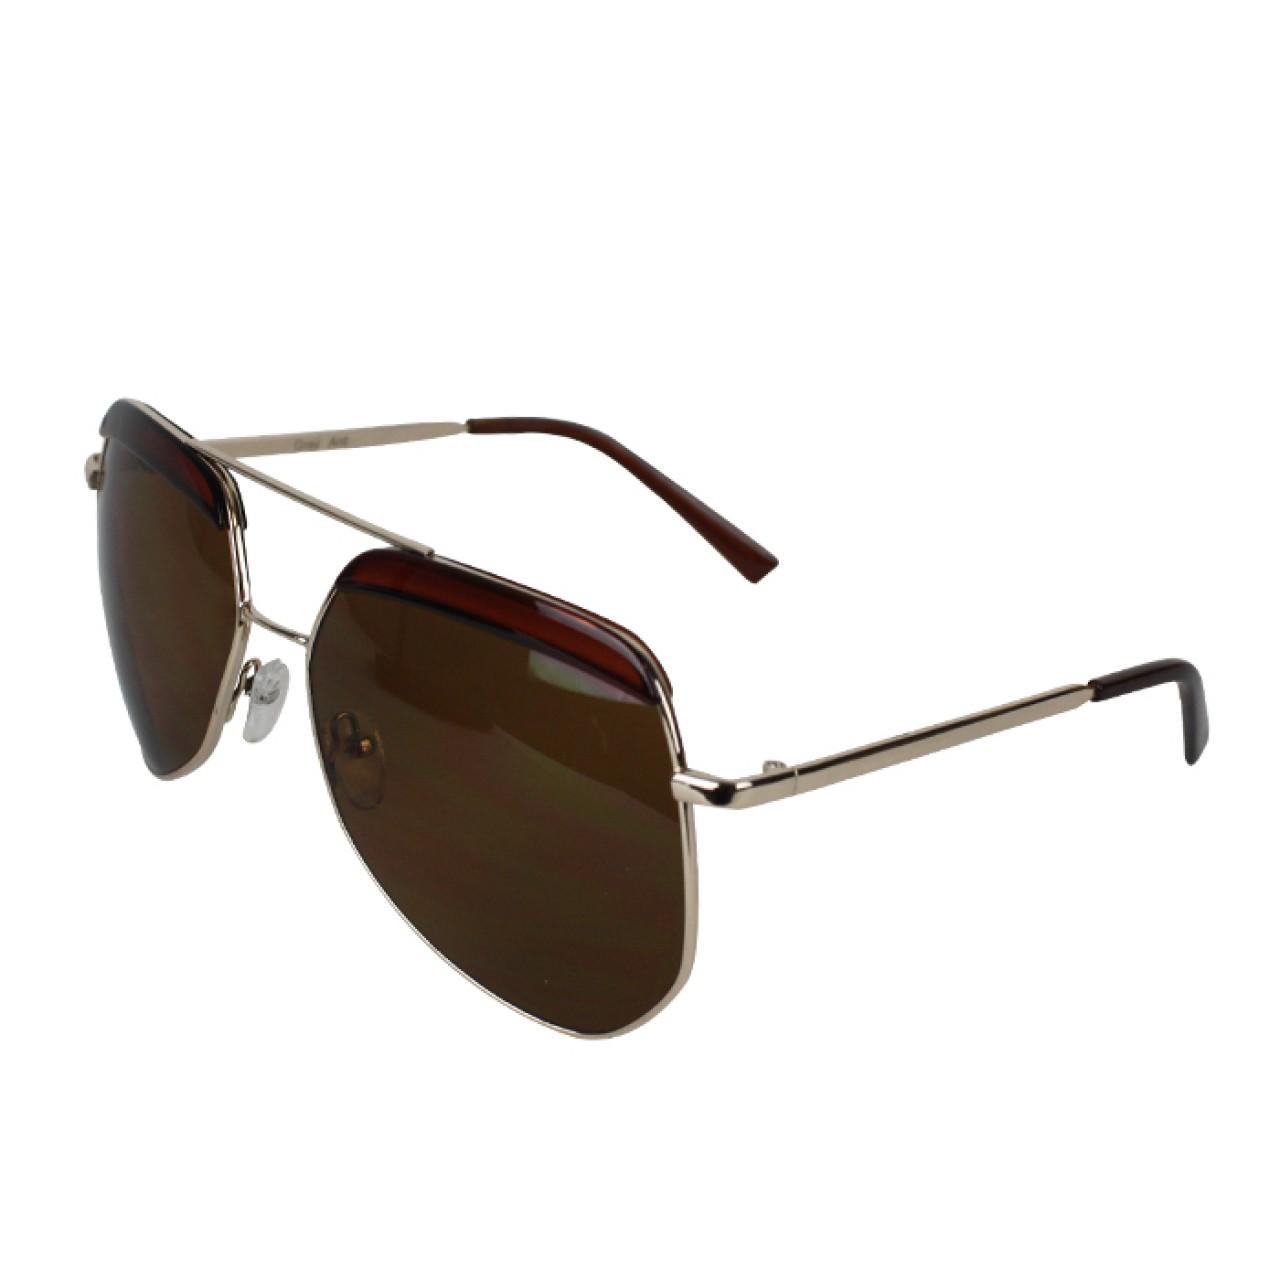 Men's UV Protected Aviator Redwood texture Sunglasses